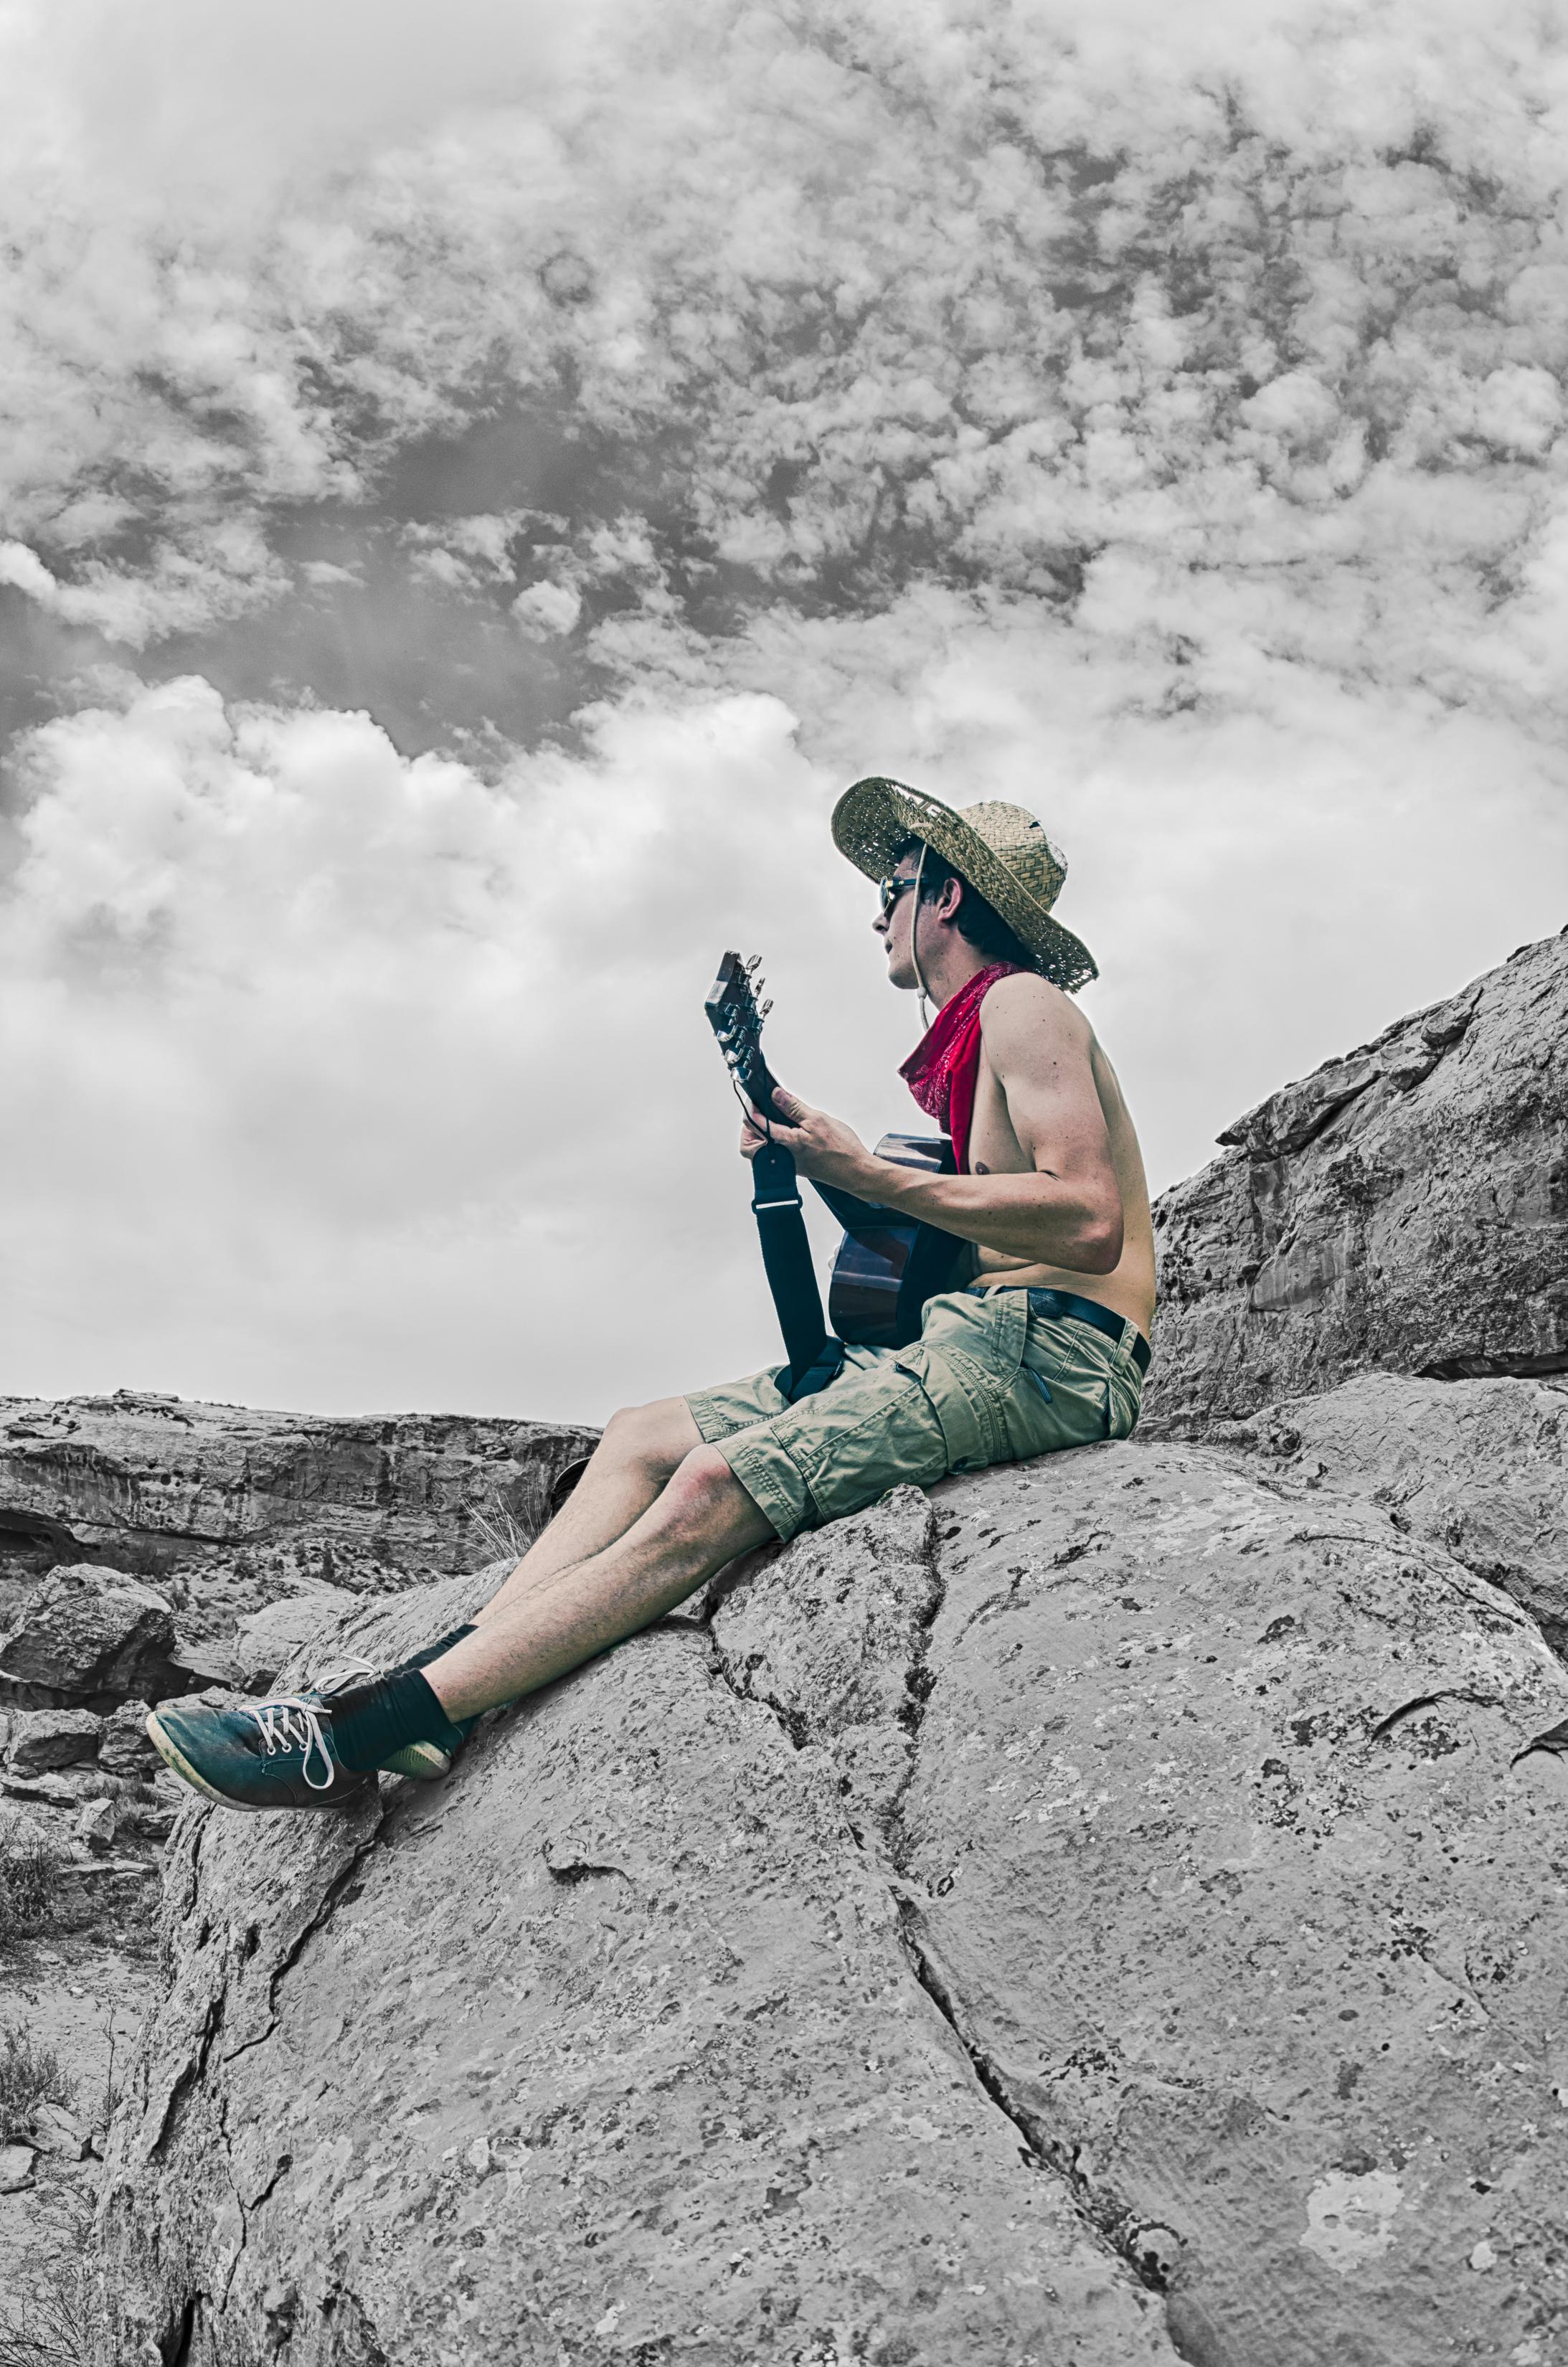 Hugo on the Rock-2.jpg